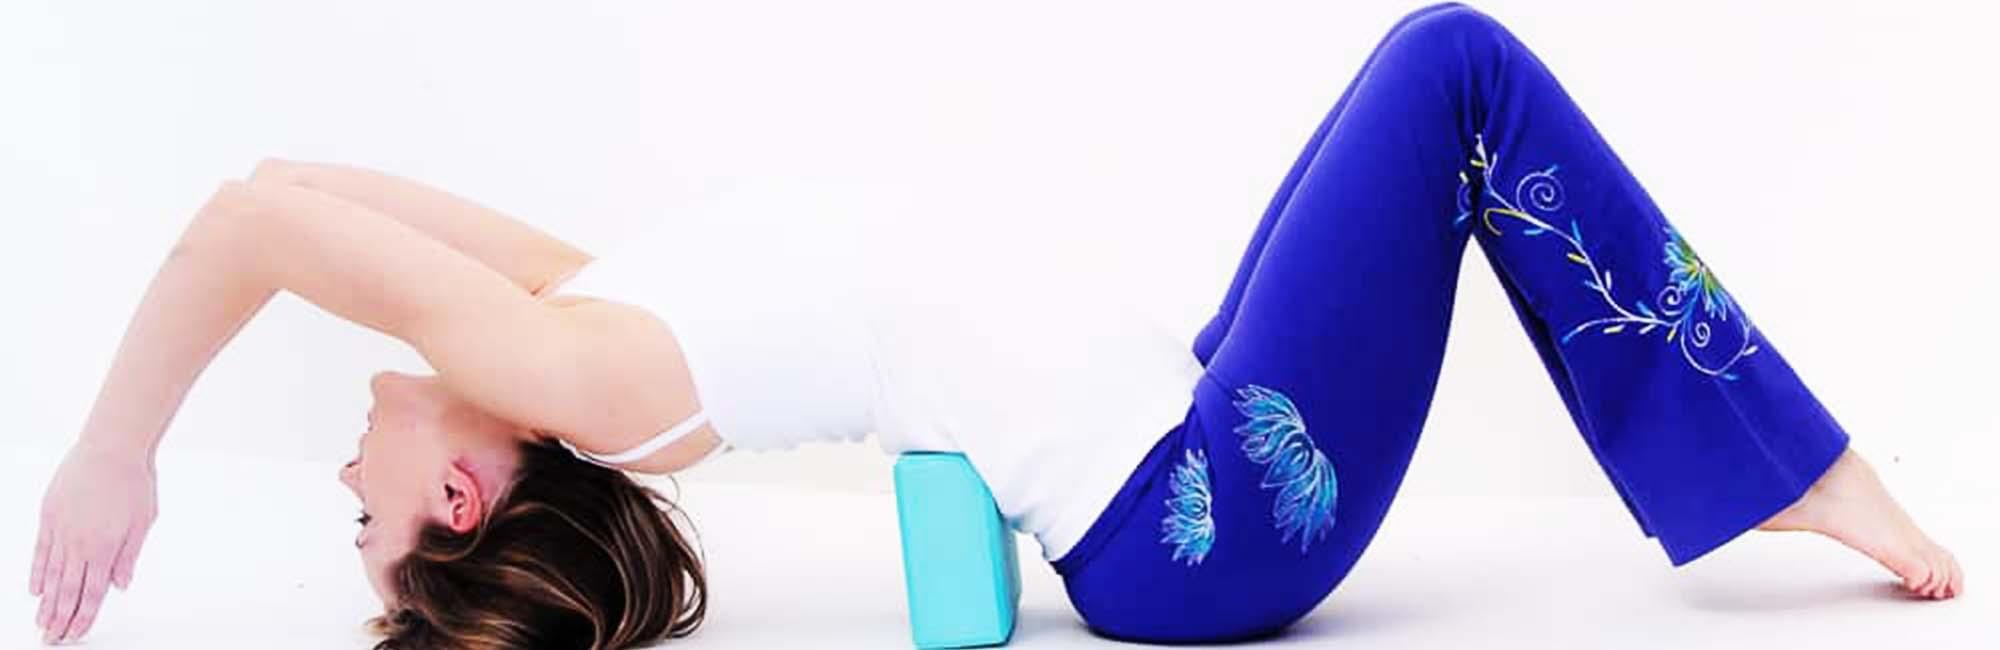 Pantalon yoga femme bleu fleur de lotus - Vetement ohm - Achamana